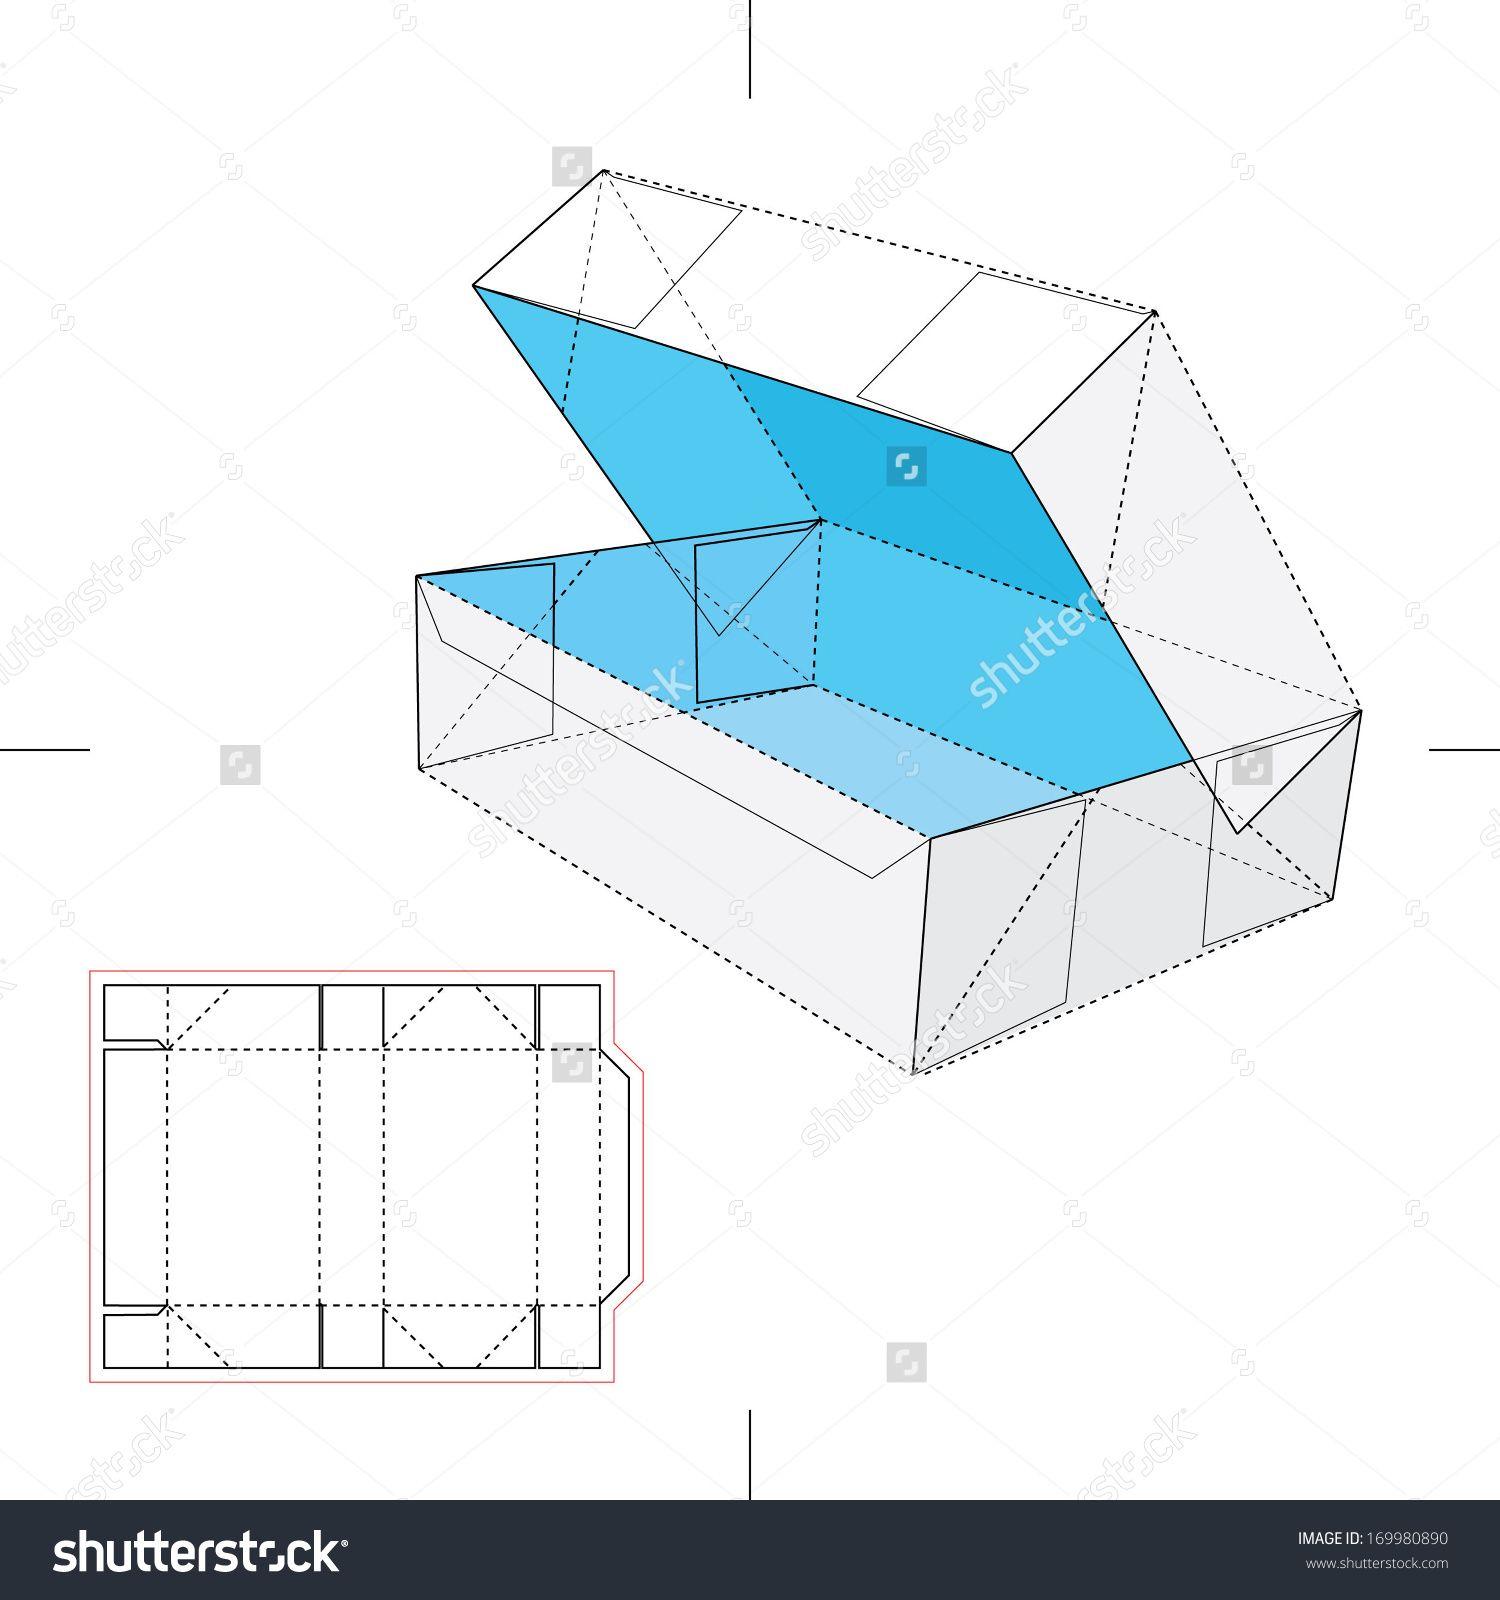 Blueprint box with blueprint layout stock vector illustration blueprint box with blueprint layout malvernweather Image collections